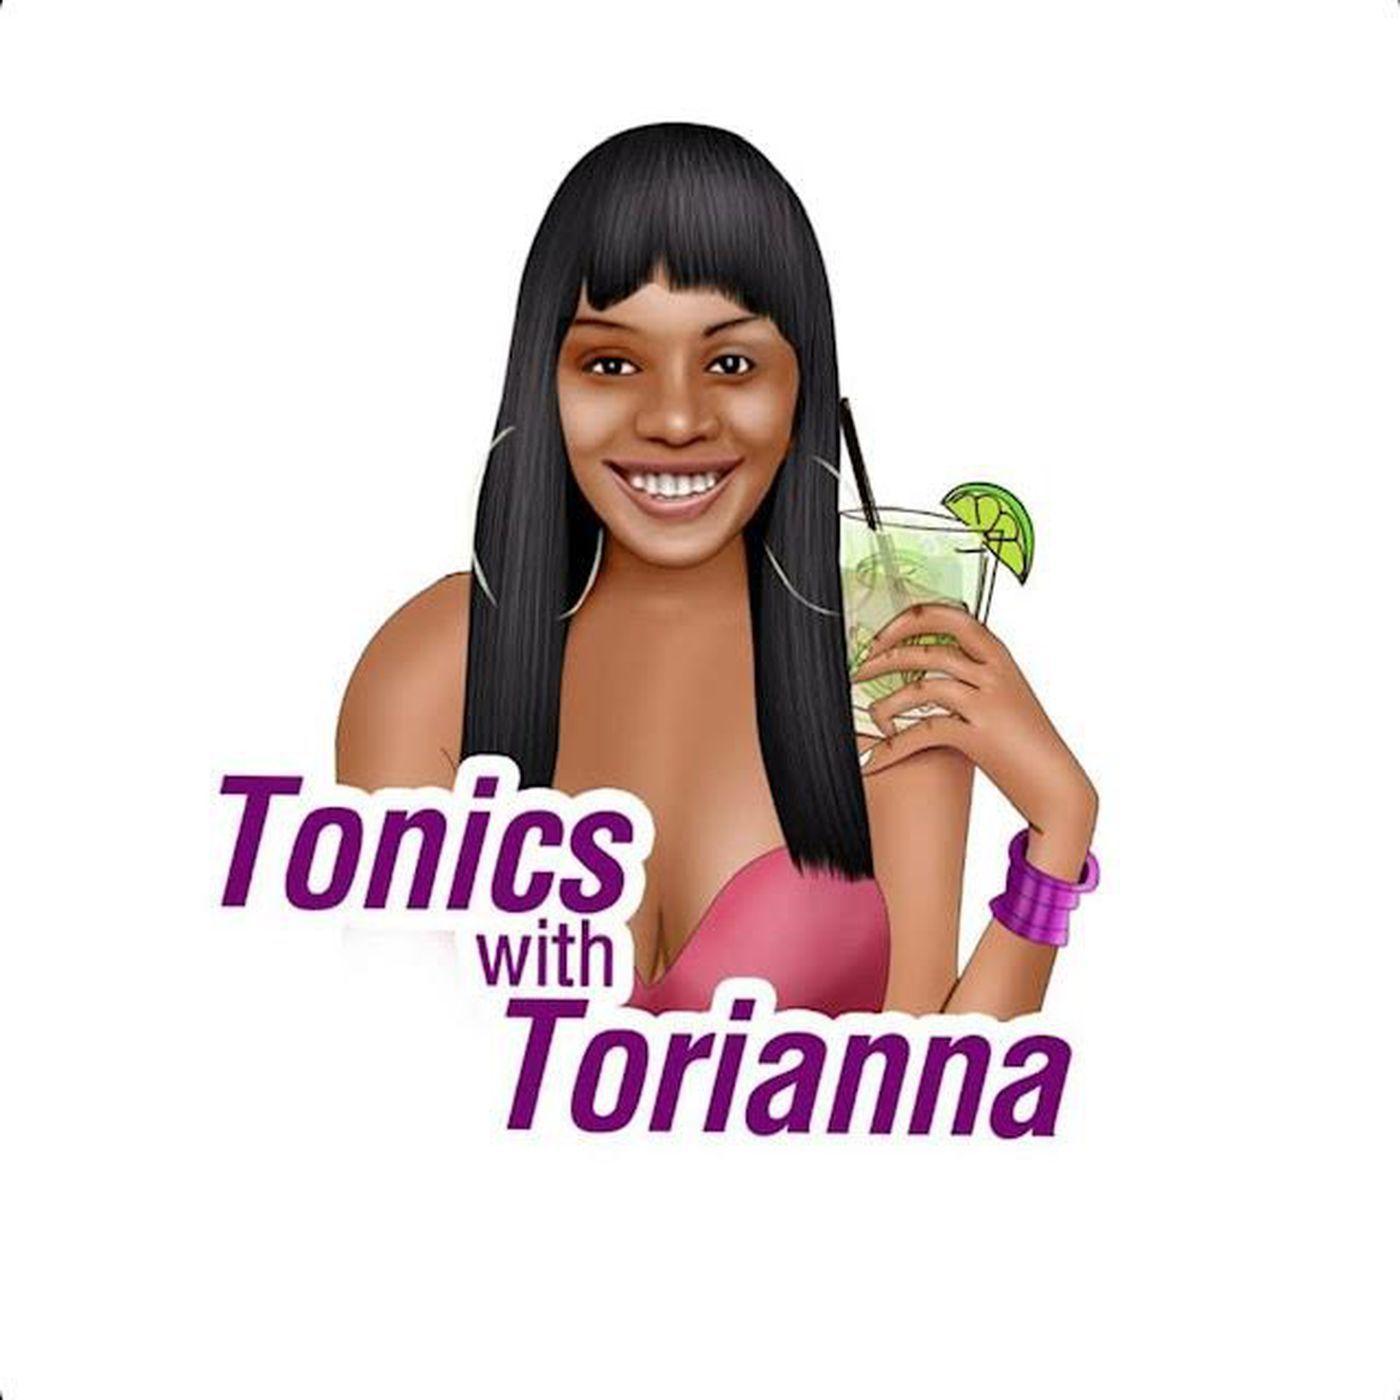 Tonics with Torianna